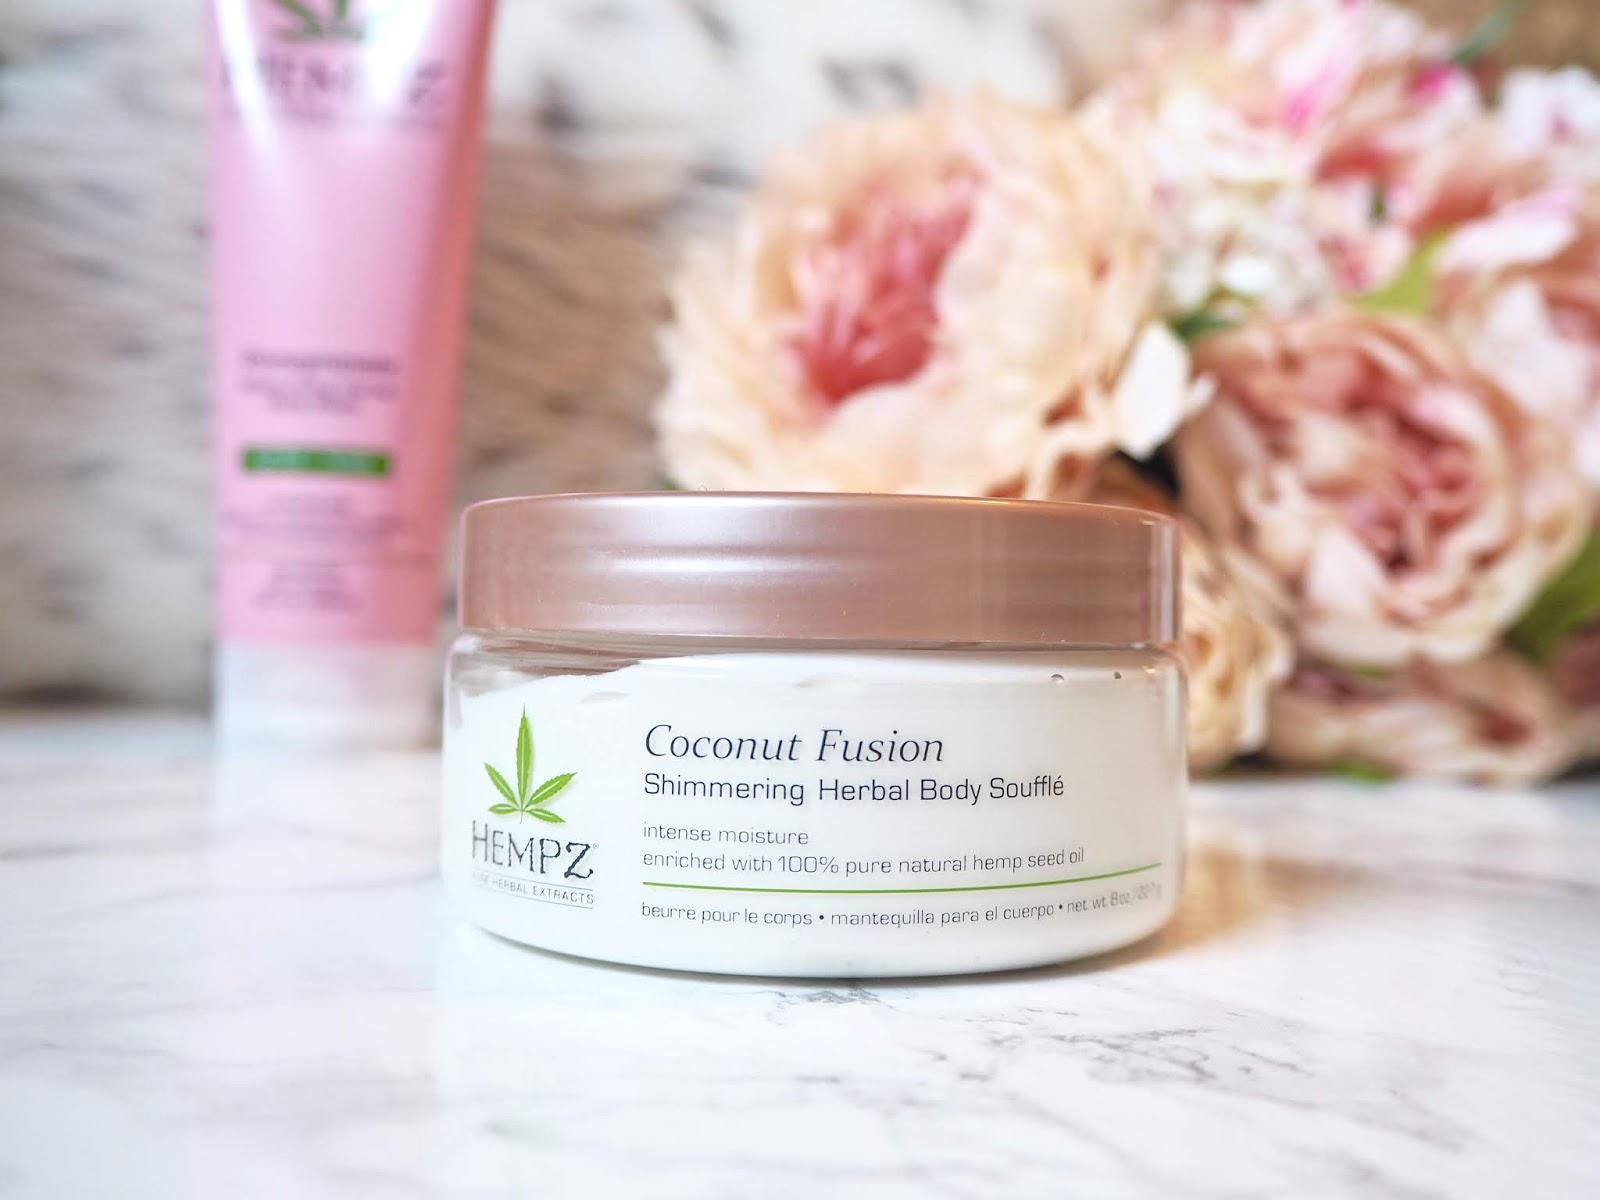 Hempz Skincare Range Coconut Fusion